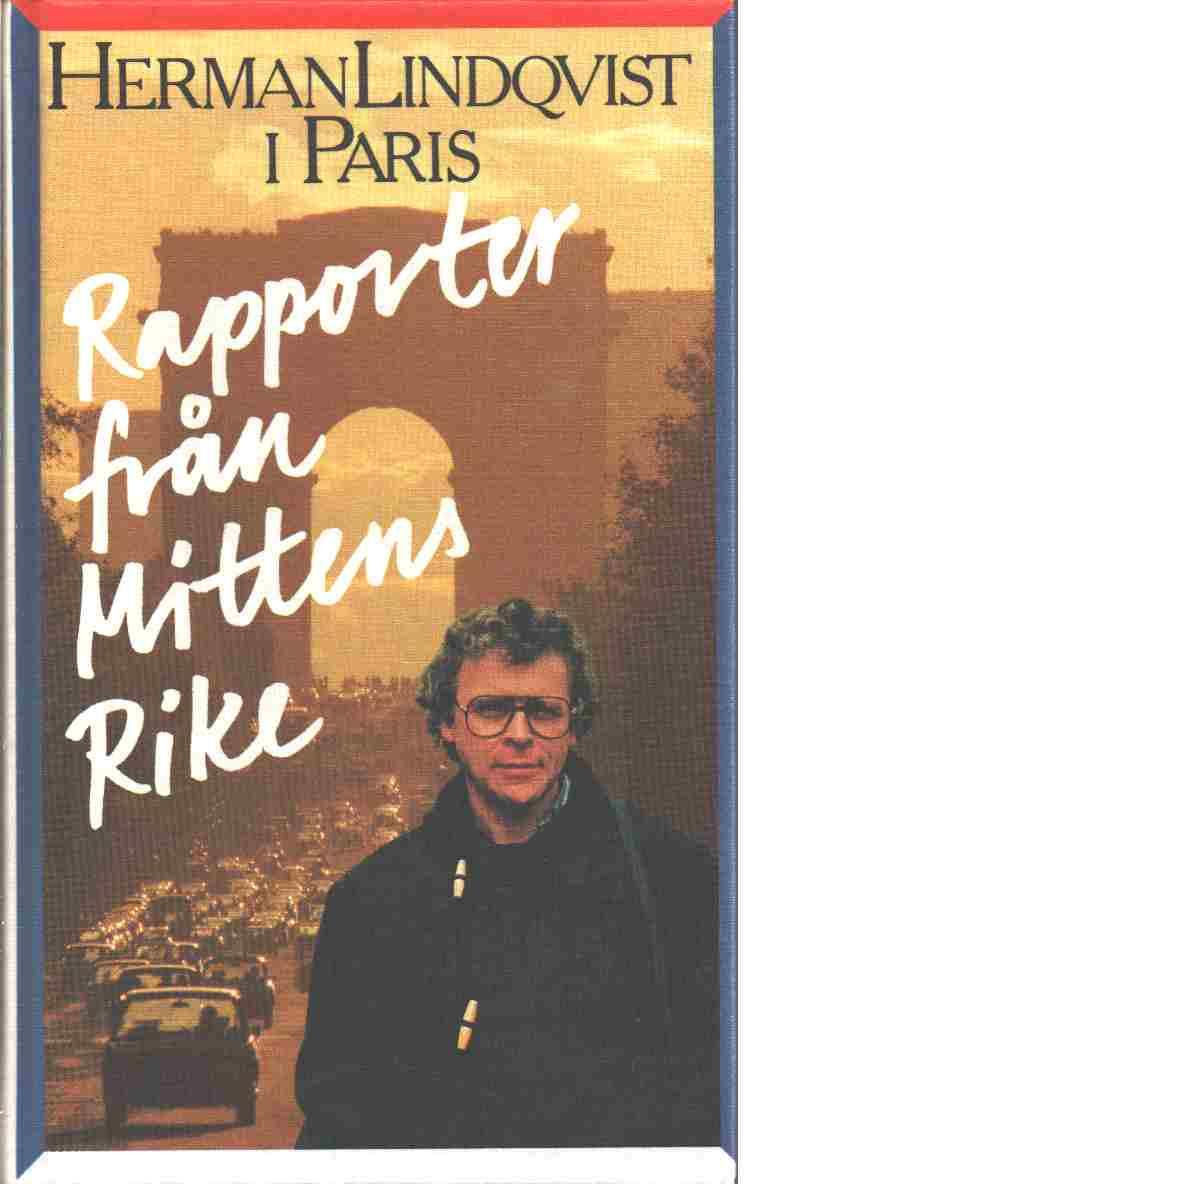 Rapporter från Mittens rike - Lindqvist, Herman